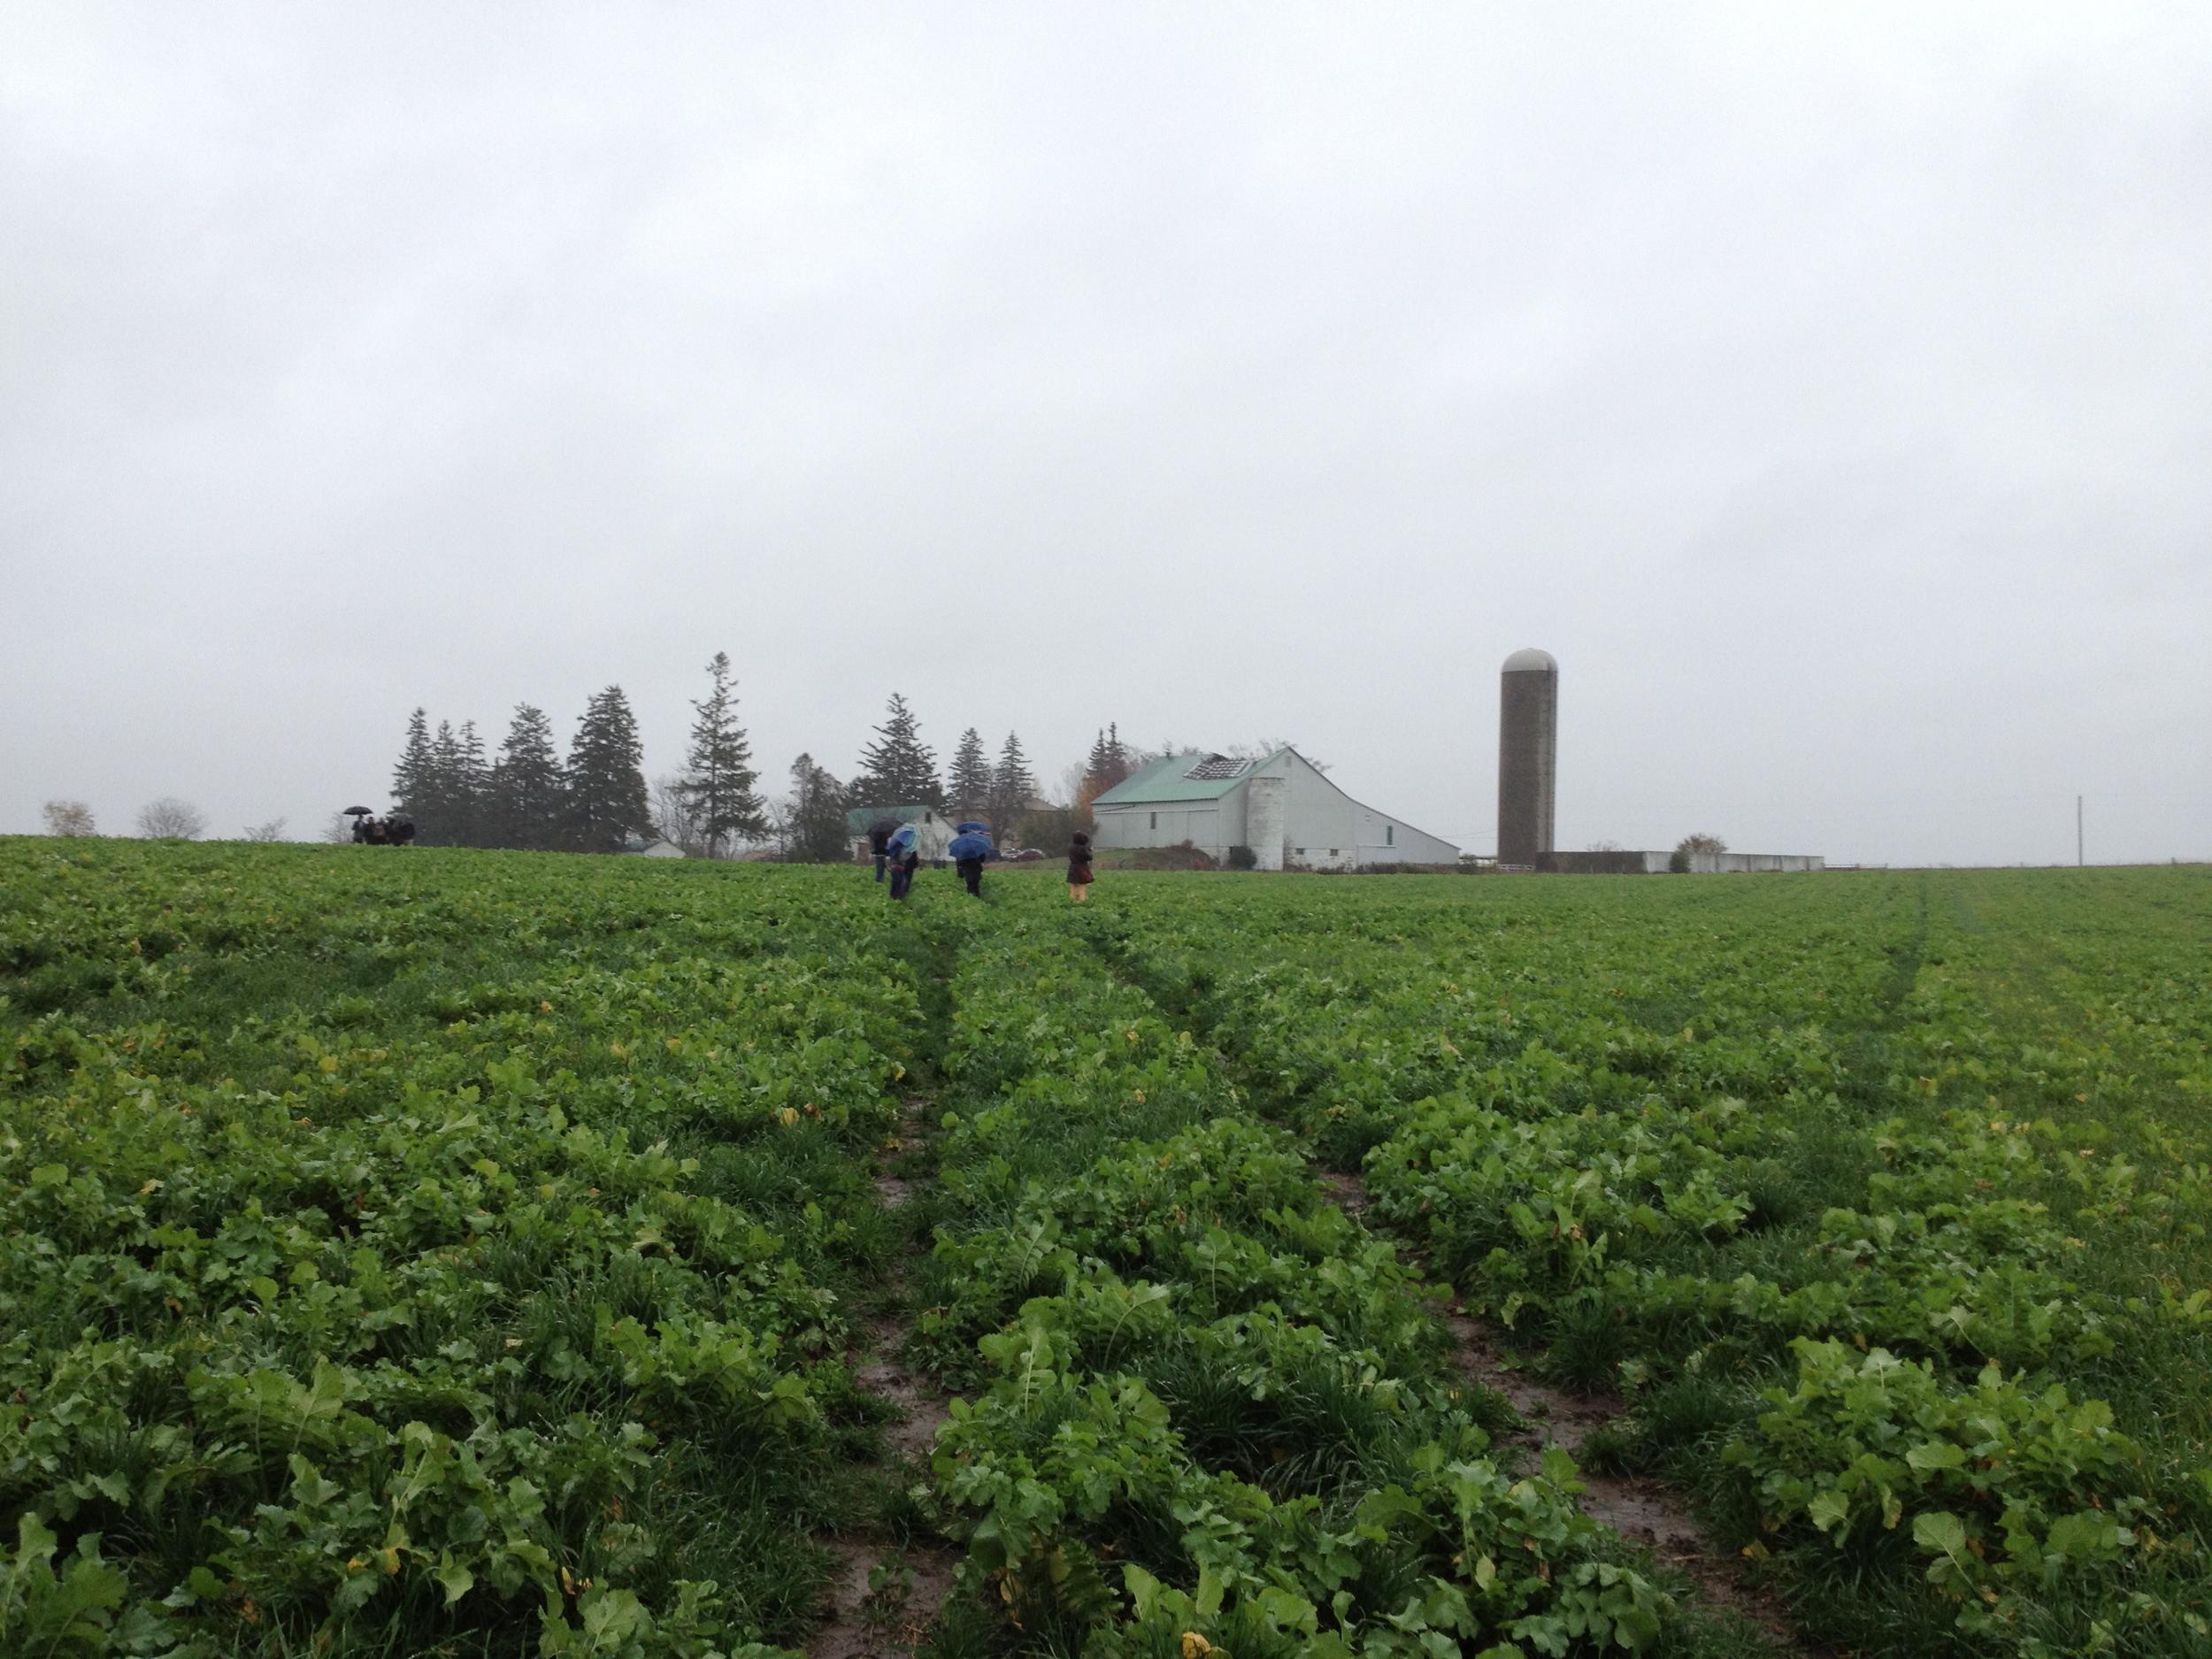 Keeping productive farmland in Waterloo Region